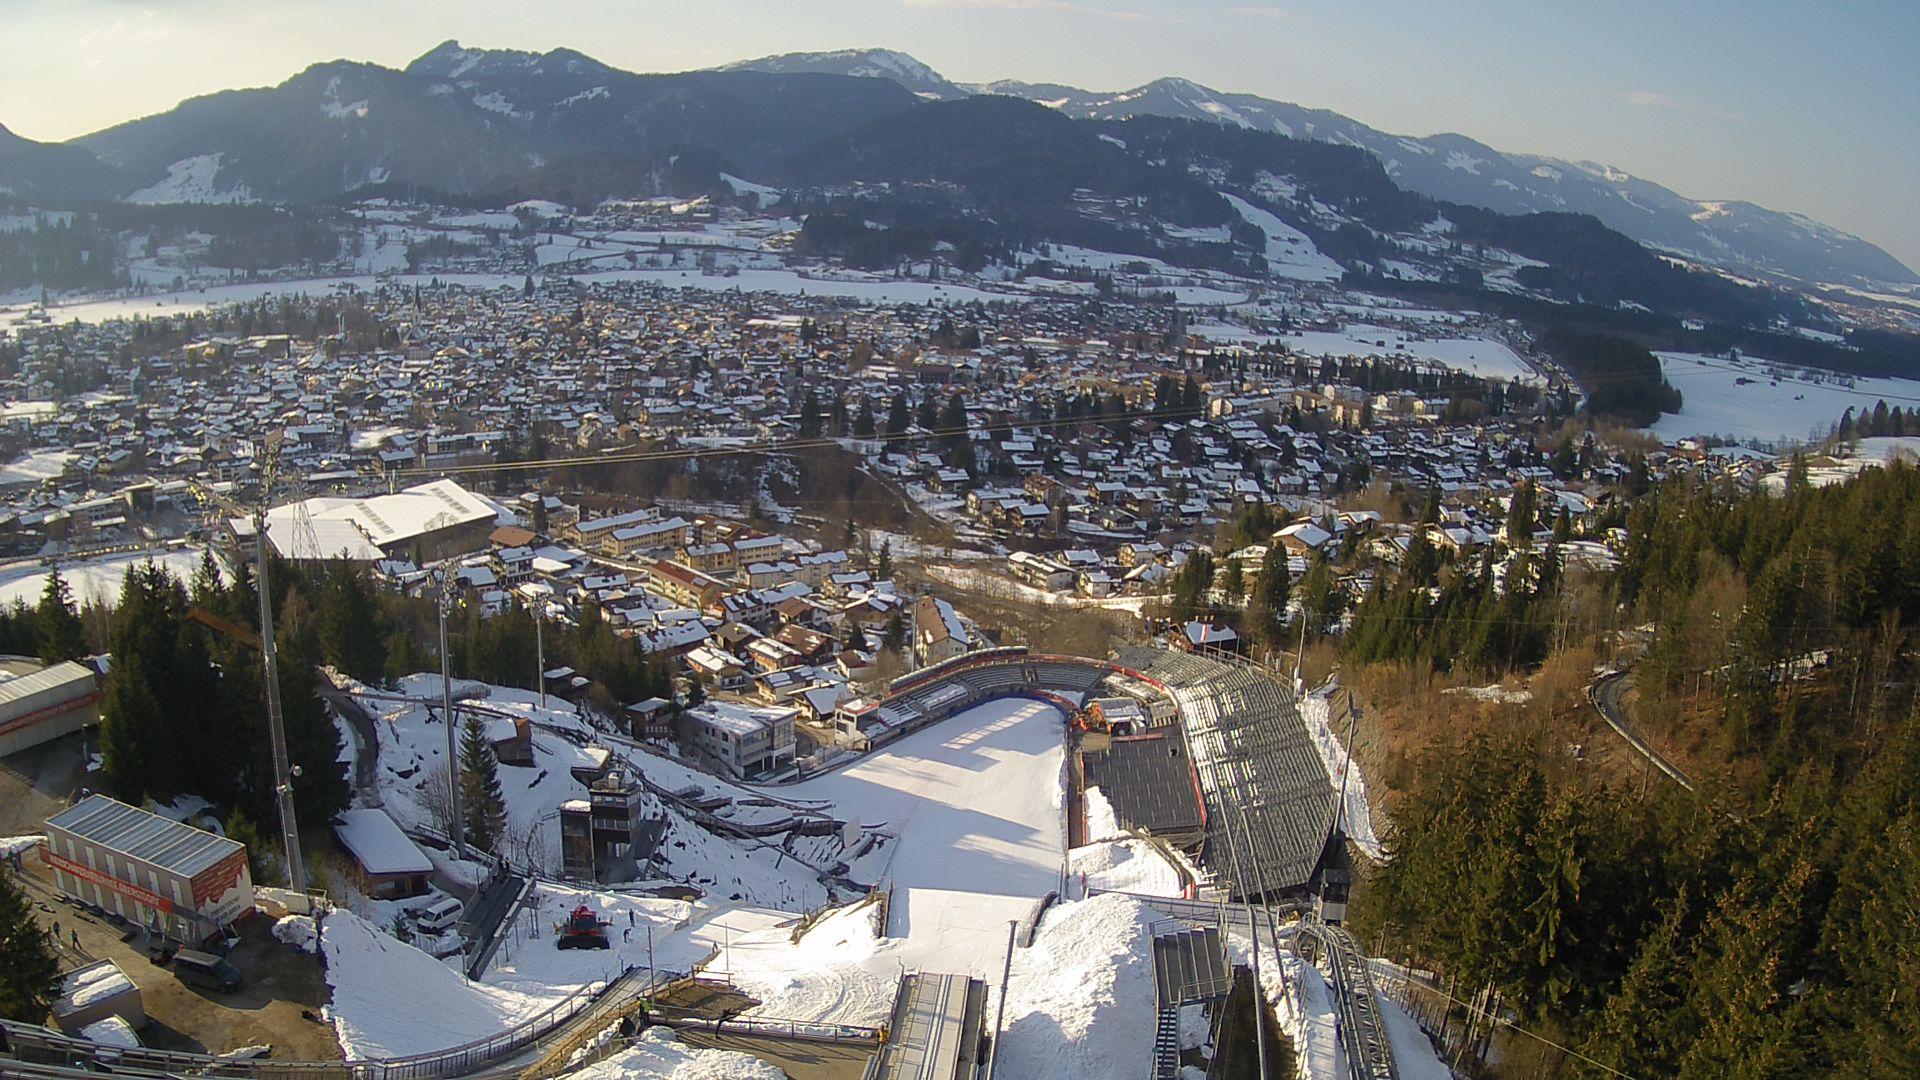 Webcam: Erdinger Arena